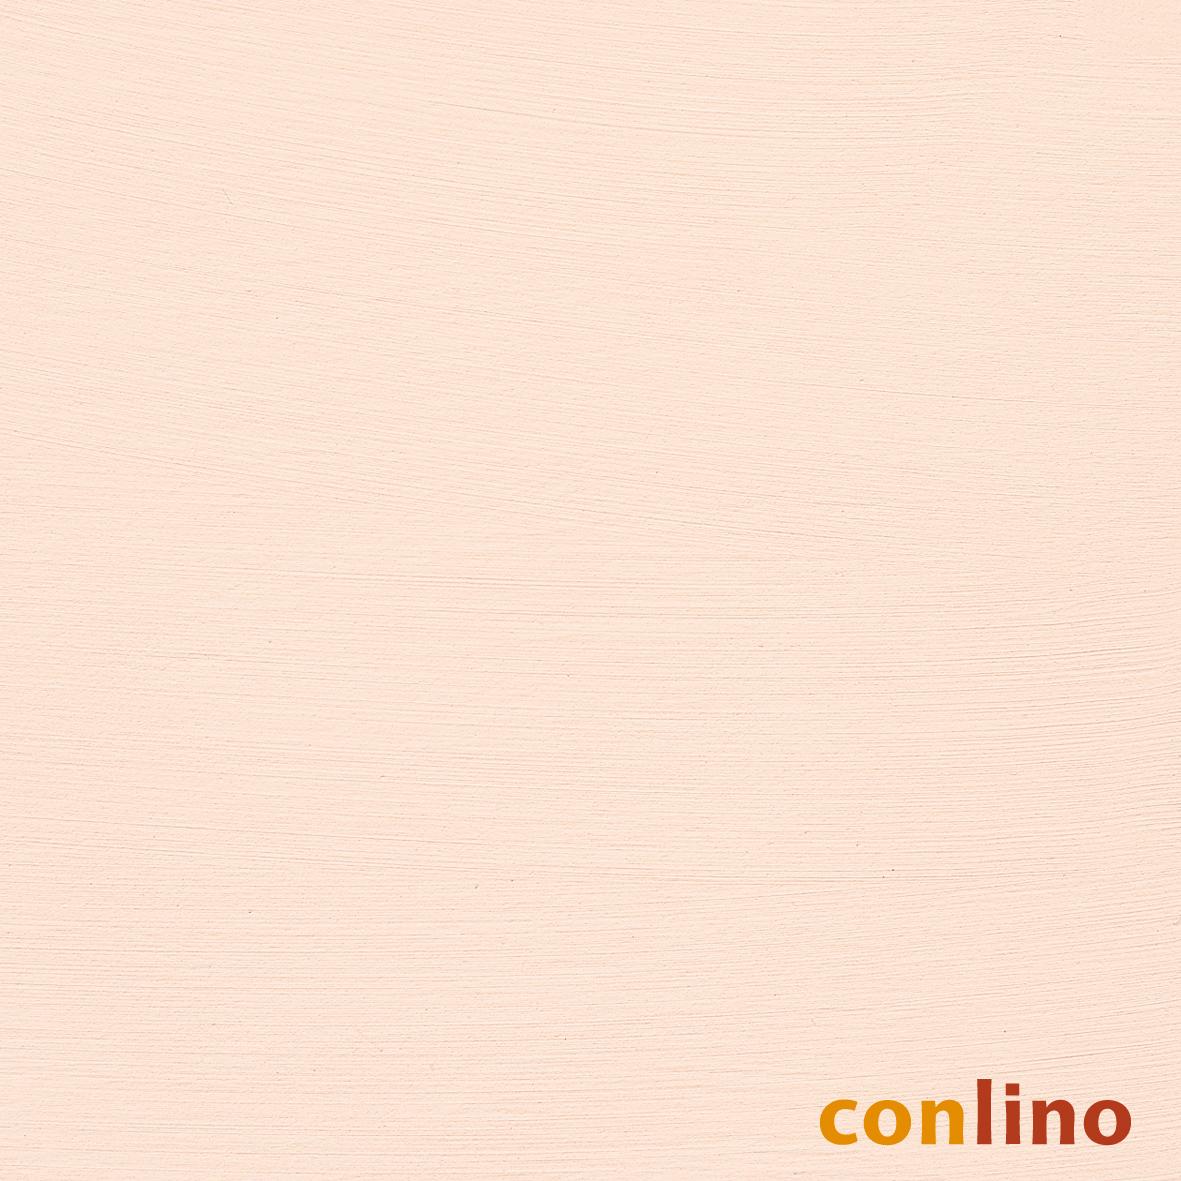 conluto Lehmfarbe Puder CL 103